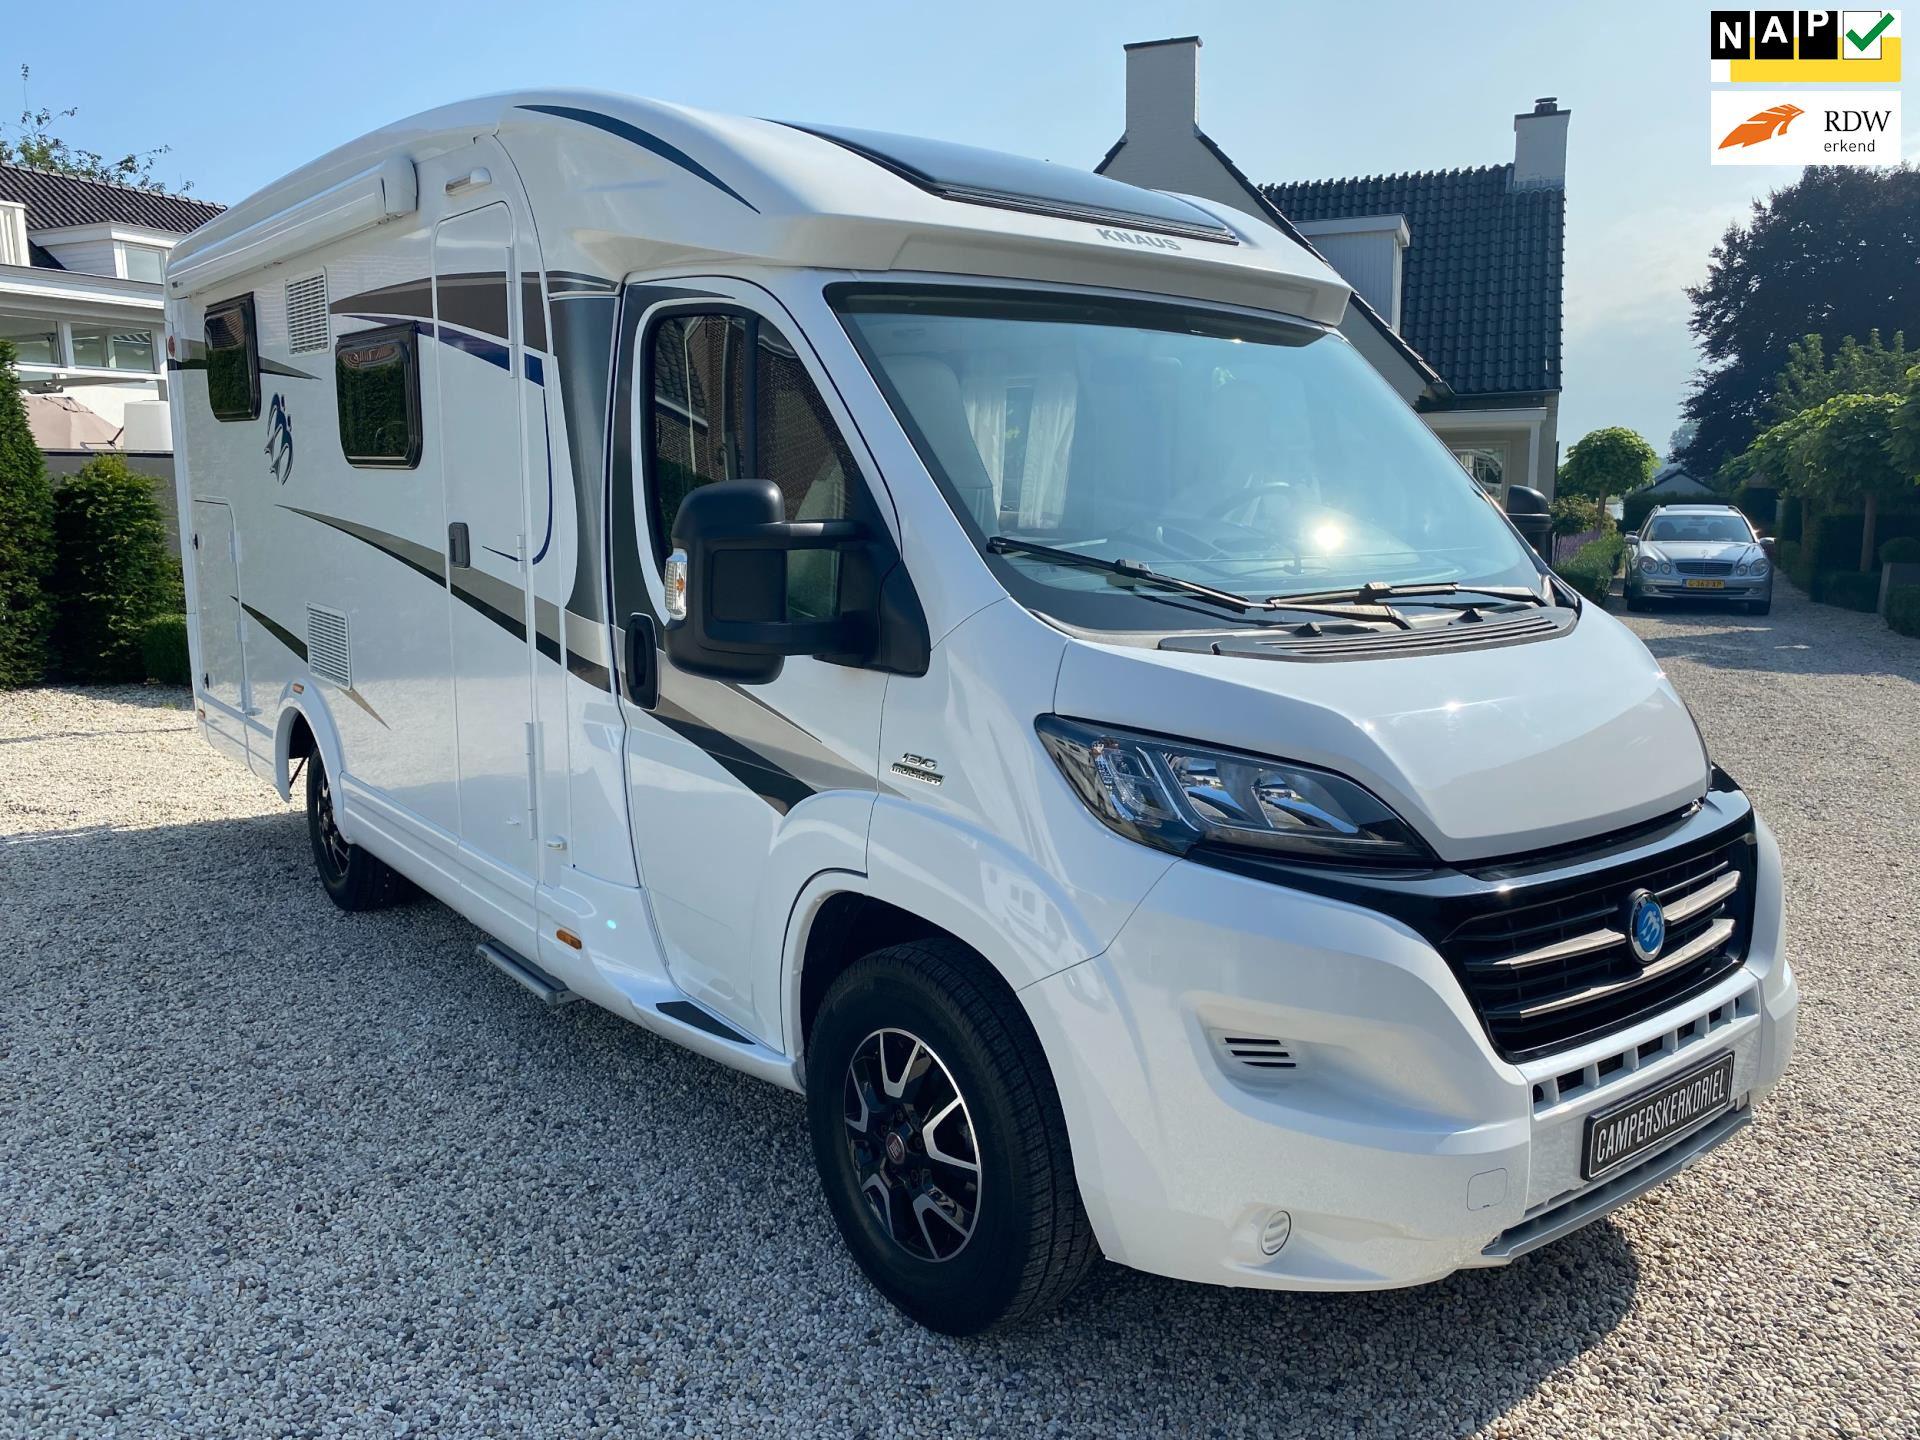 Knaus Van TI 600 MEG Lengte-bedden Garage occasion - Campers Kerkdriel